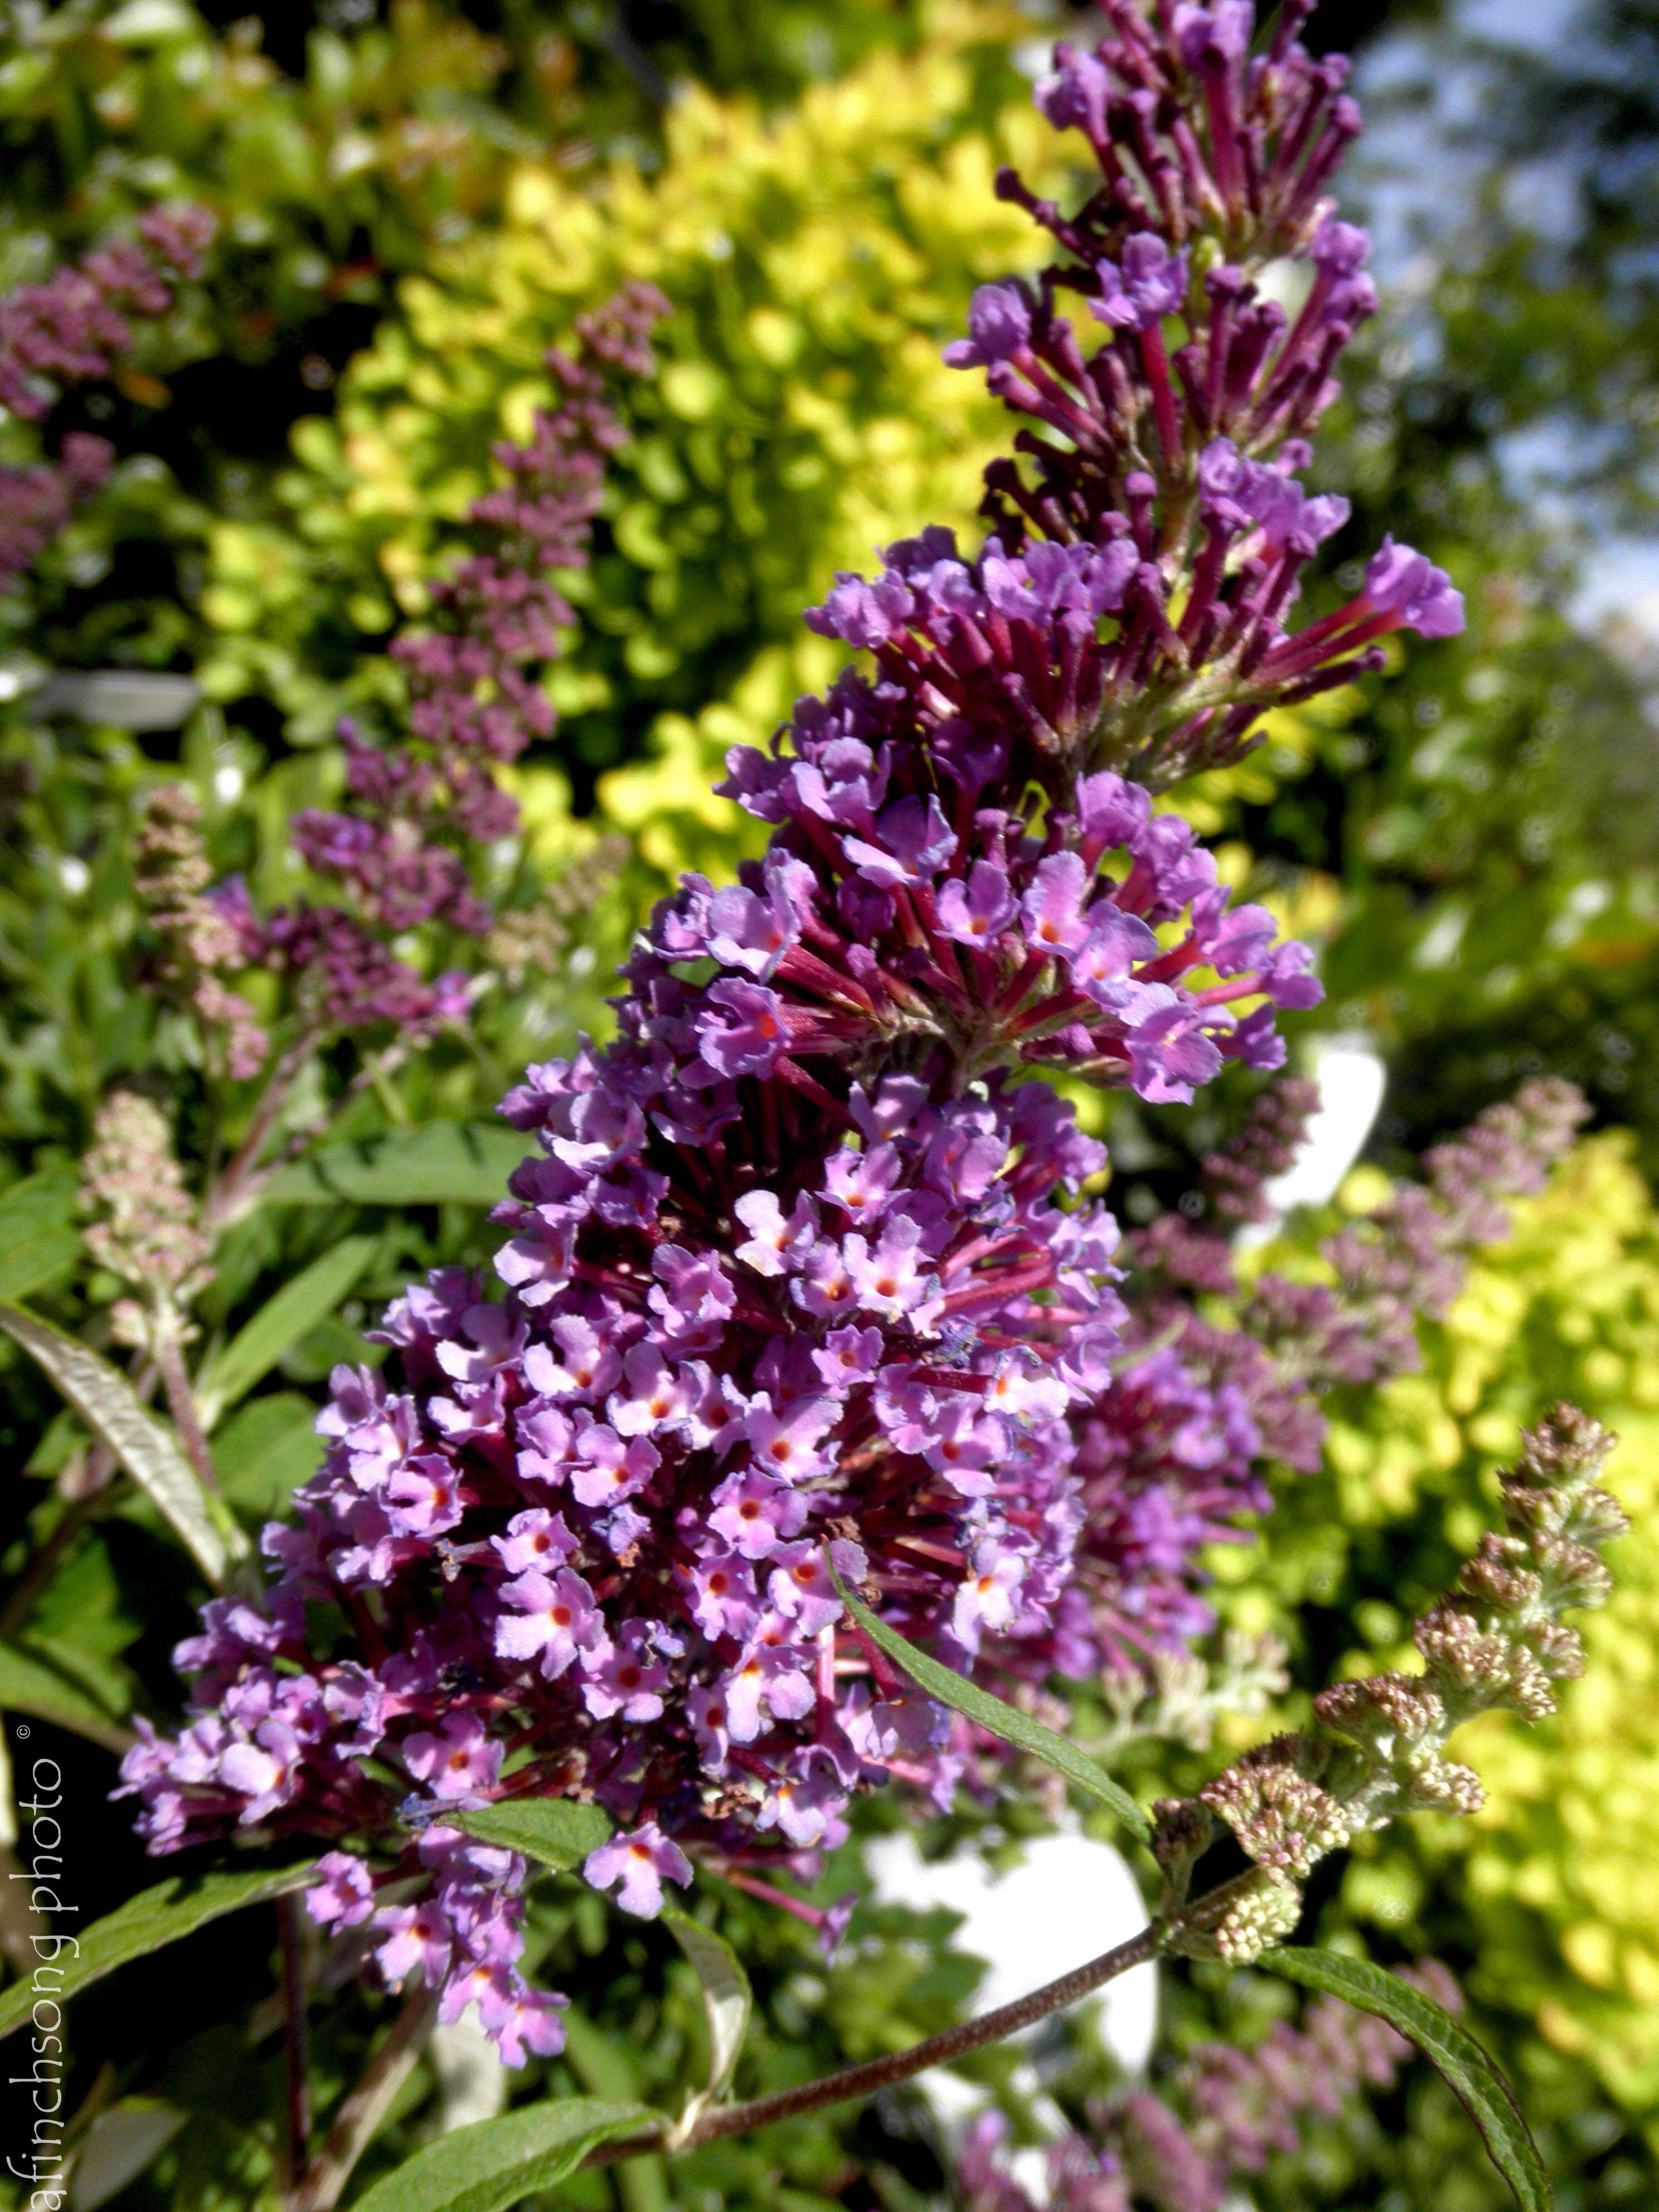 Buddleia Purple Emperor Purple Emperor Butterfly Bush Deciduous Flowering Shrub Full Sun 10 Year Siz Flowering Shrubs Full Sun Flowering Shrubs Flower Spike